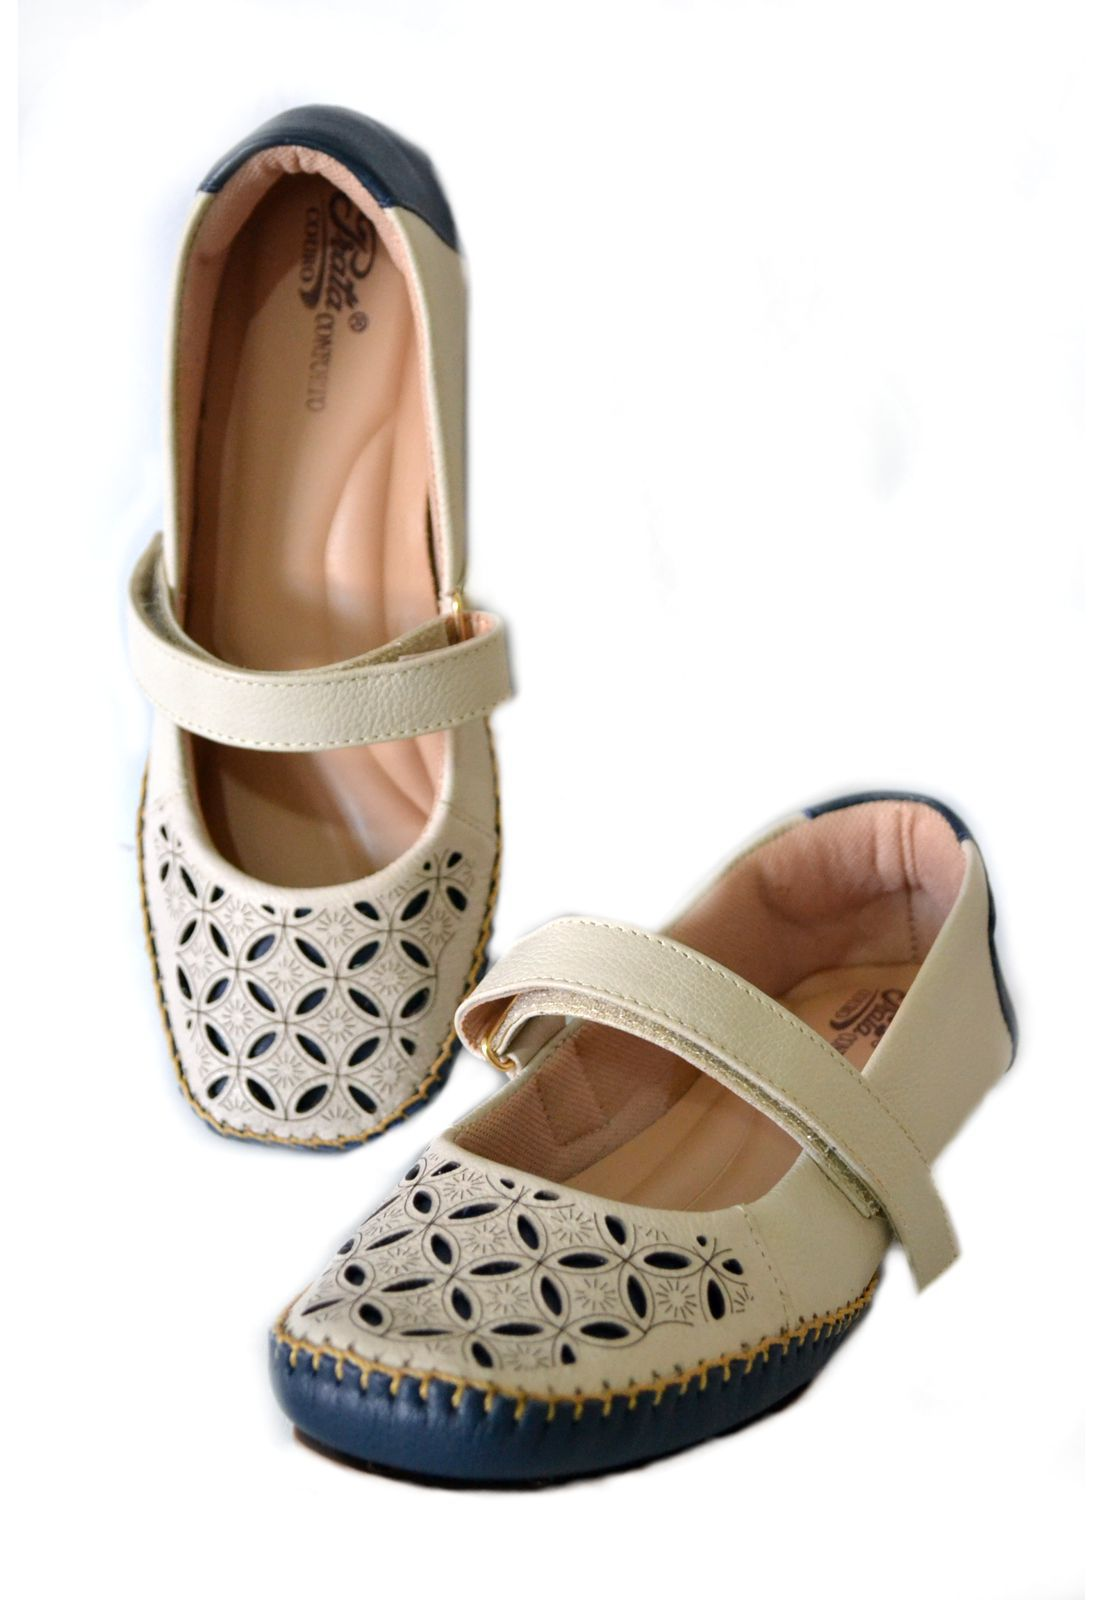 Sapato Feminino  Prata Couro Conforto 1010041 Marfim/marinho